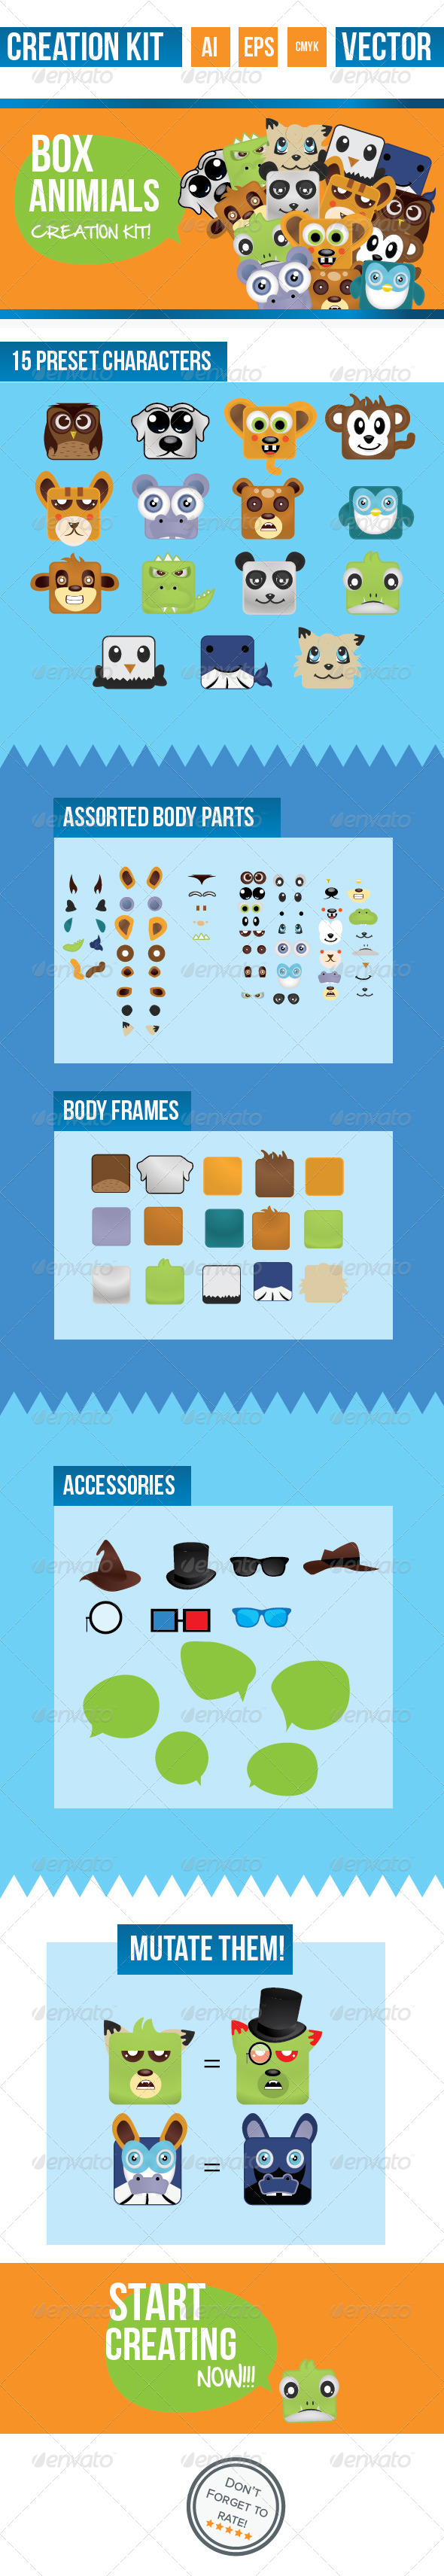 GraphicRiver Box Animal Creation Kit 4097226